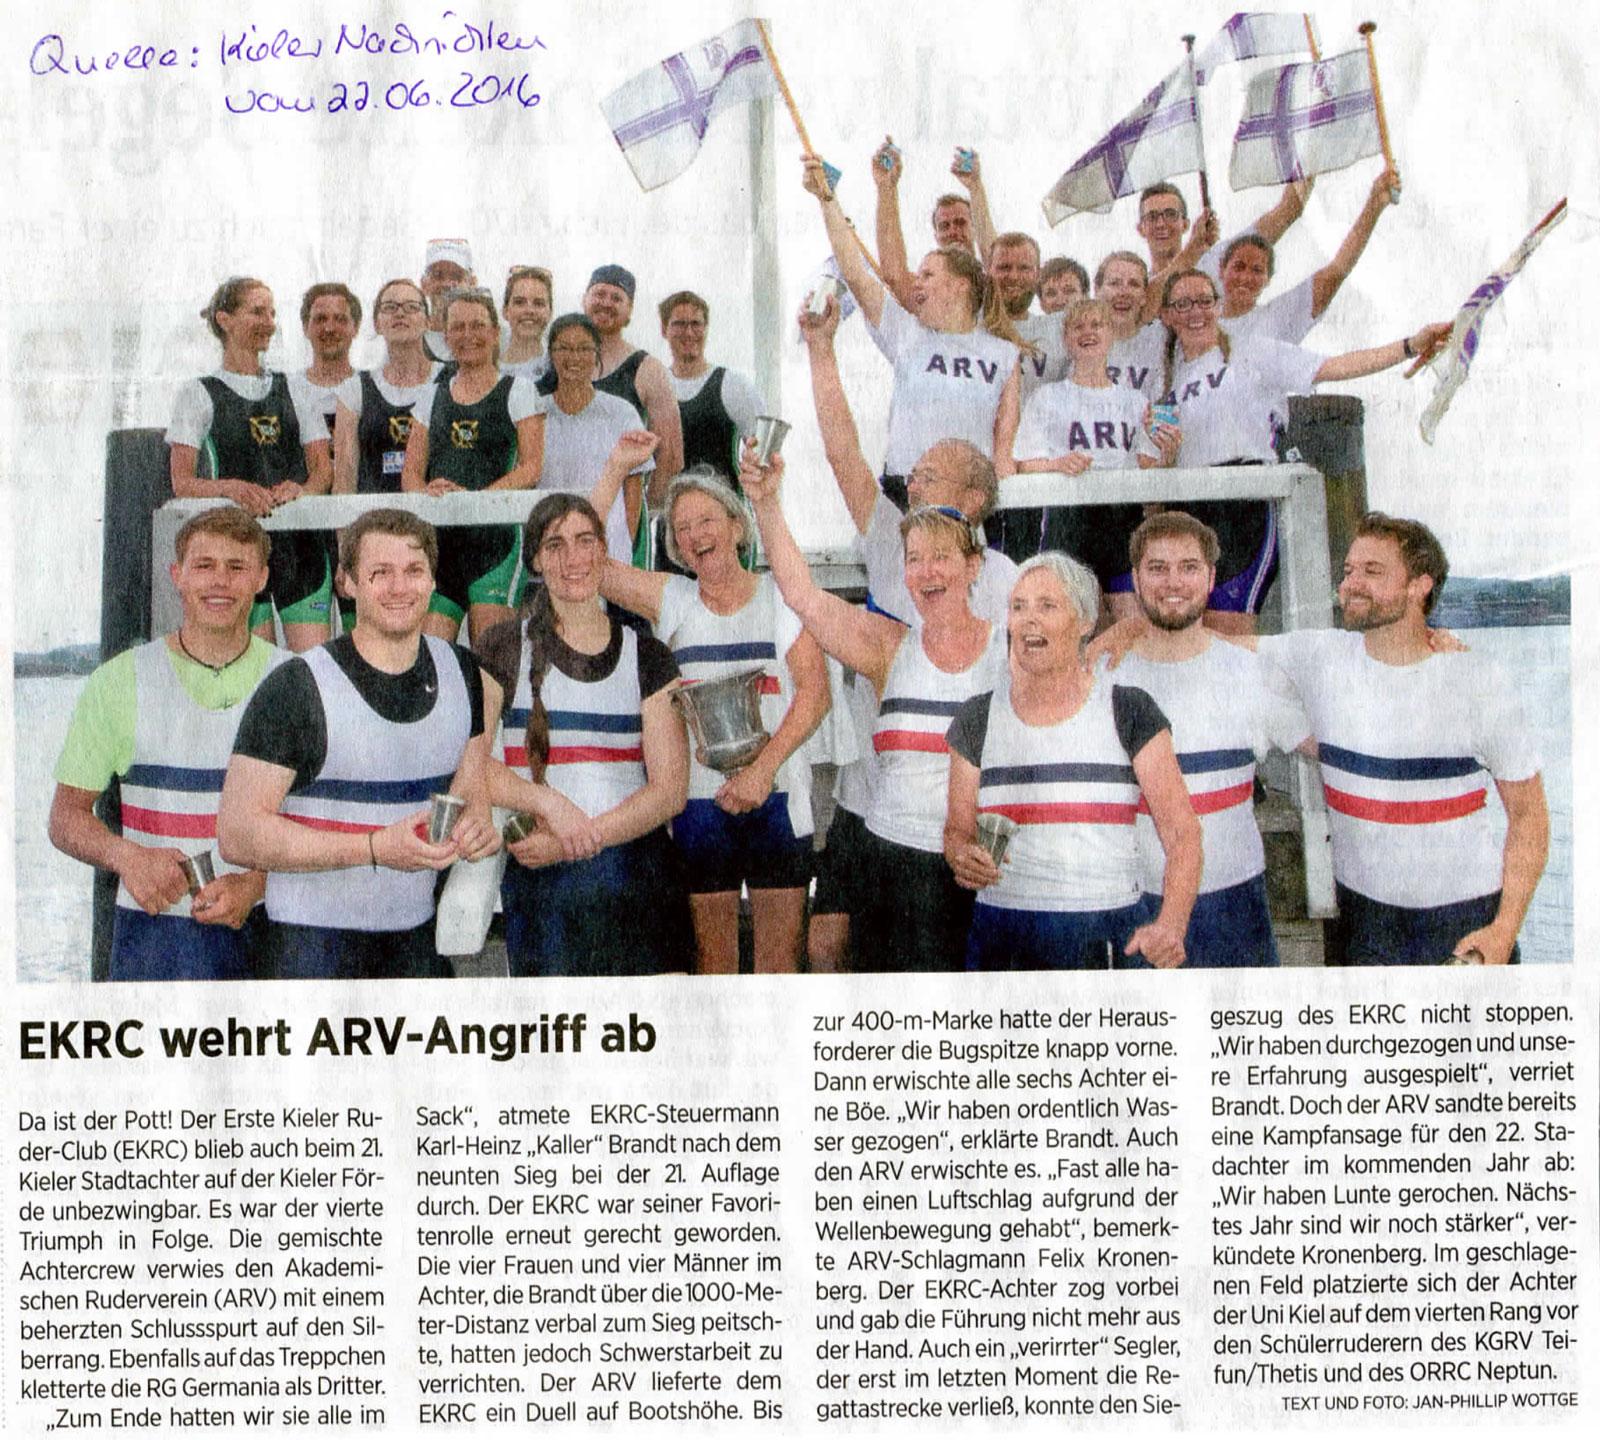 EKRC wehrt ARV-Angriff ab